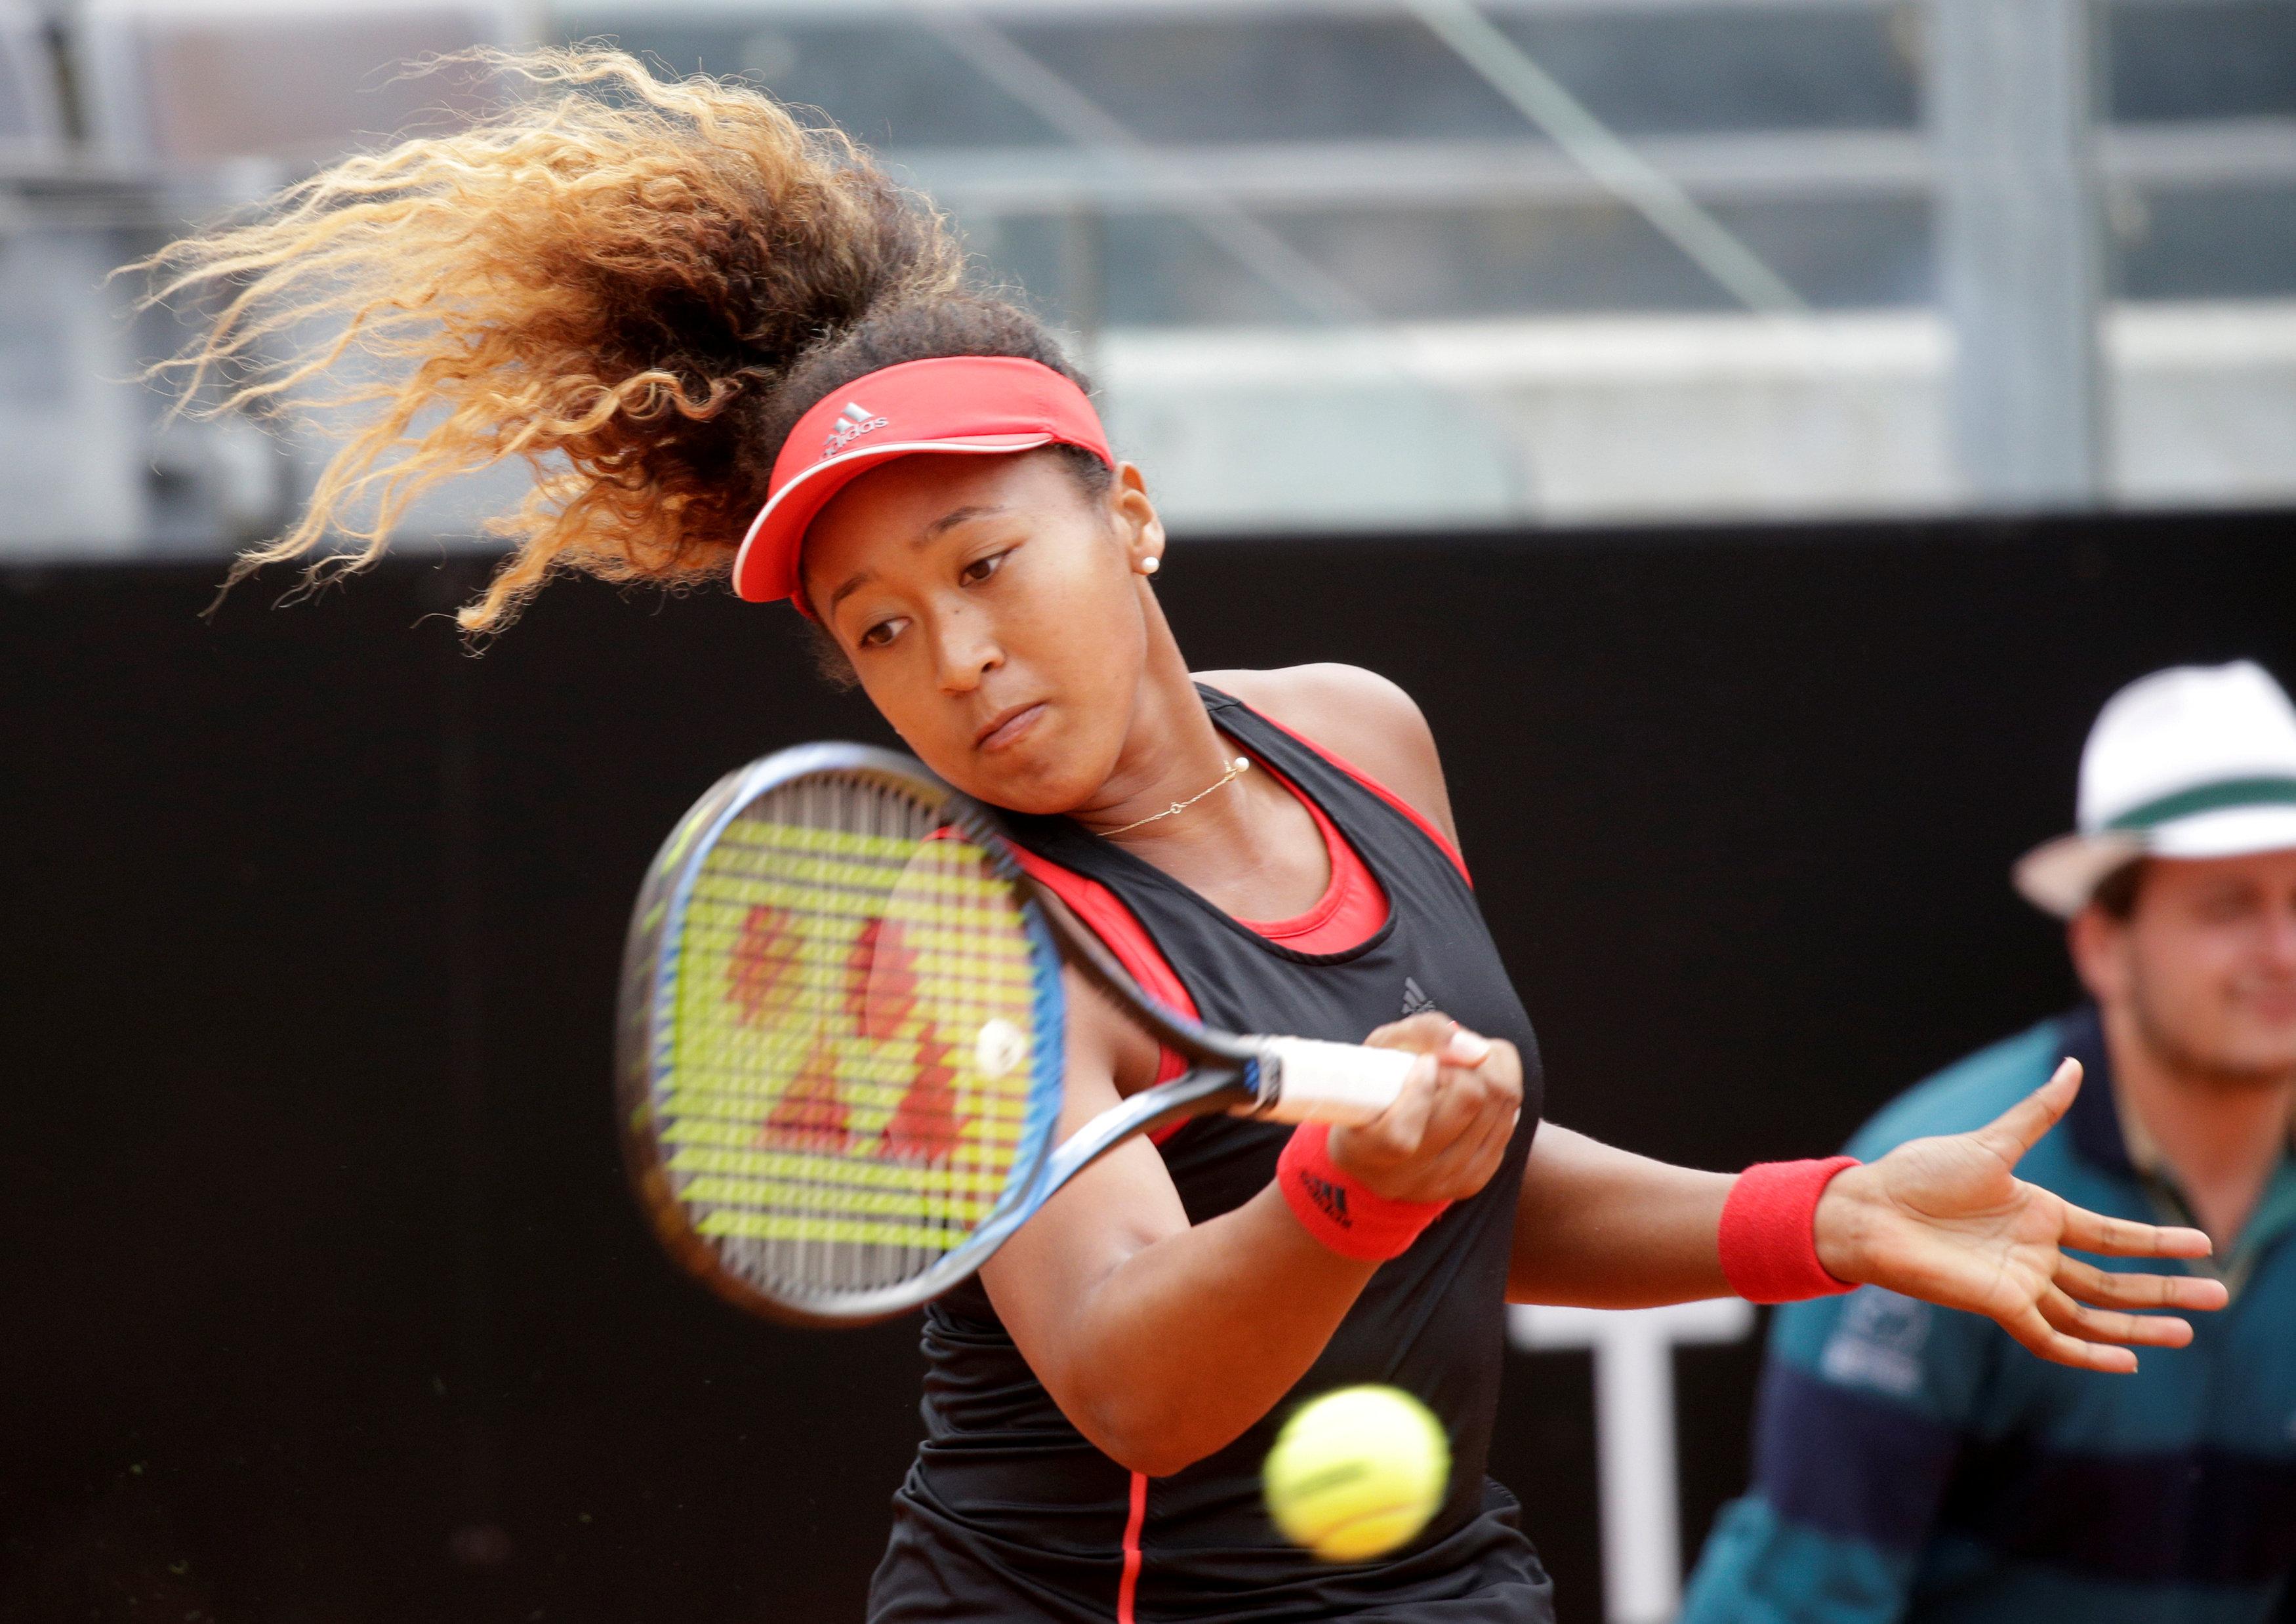 Tennis: Naomi Osaka on the climb, aiming high in Paris